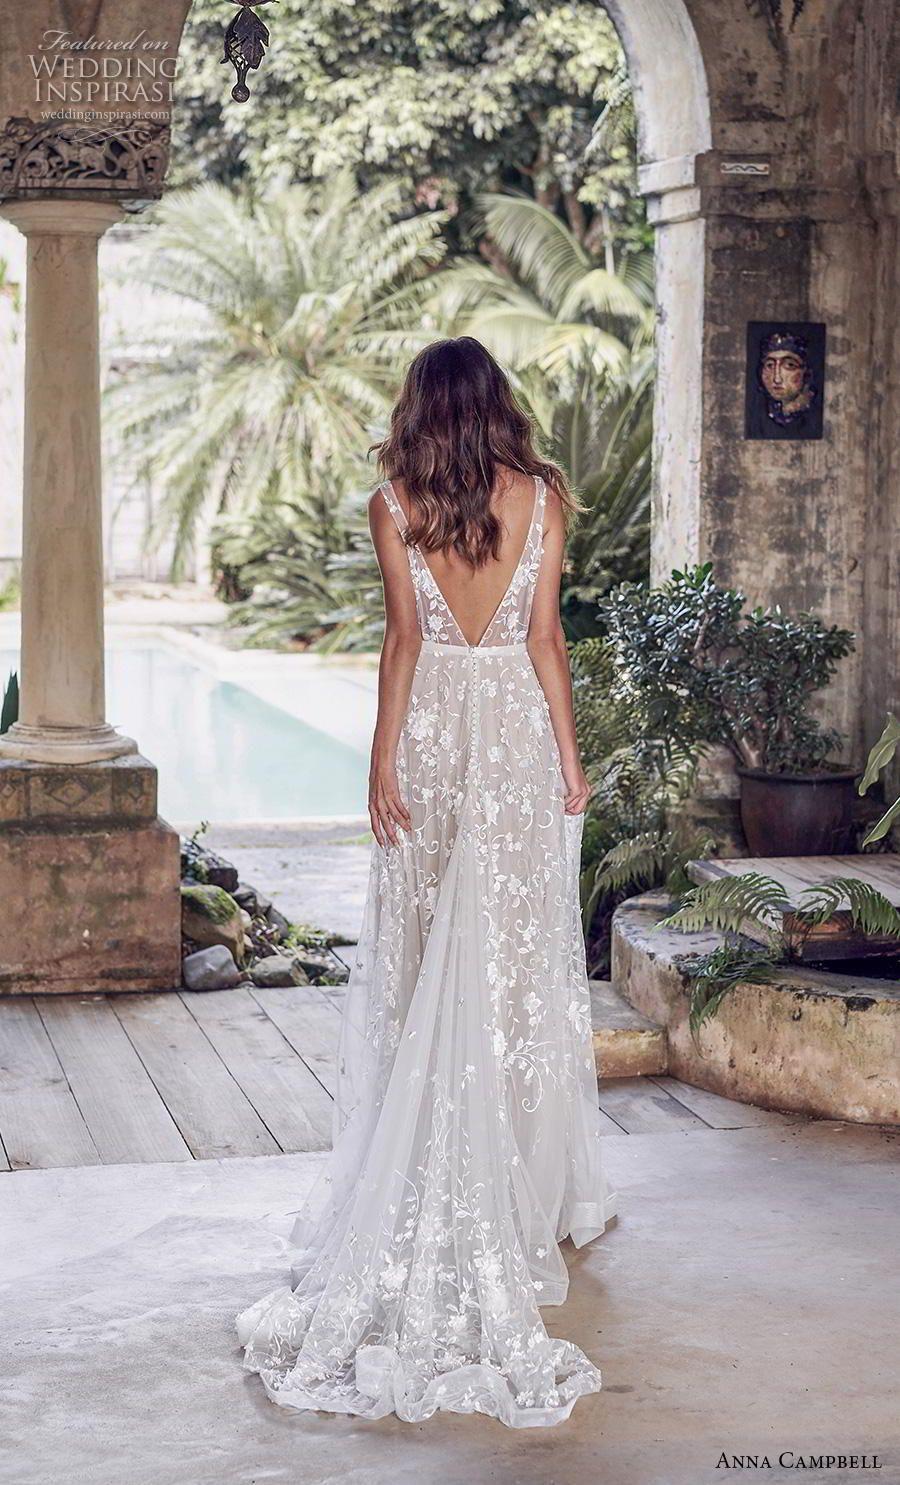 Lace v neck maxi dress april 2019 Anna Campbell  Wedding Dresses u ucWanderlustud Bridal Collection